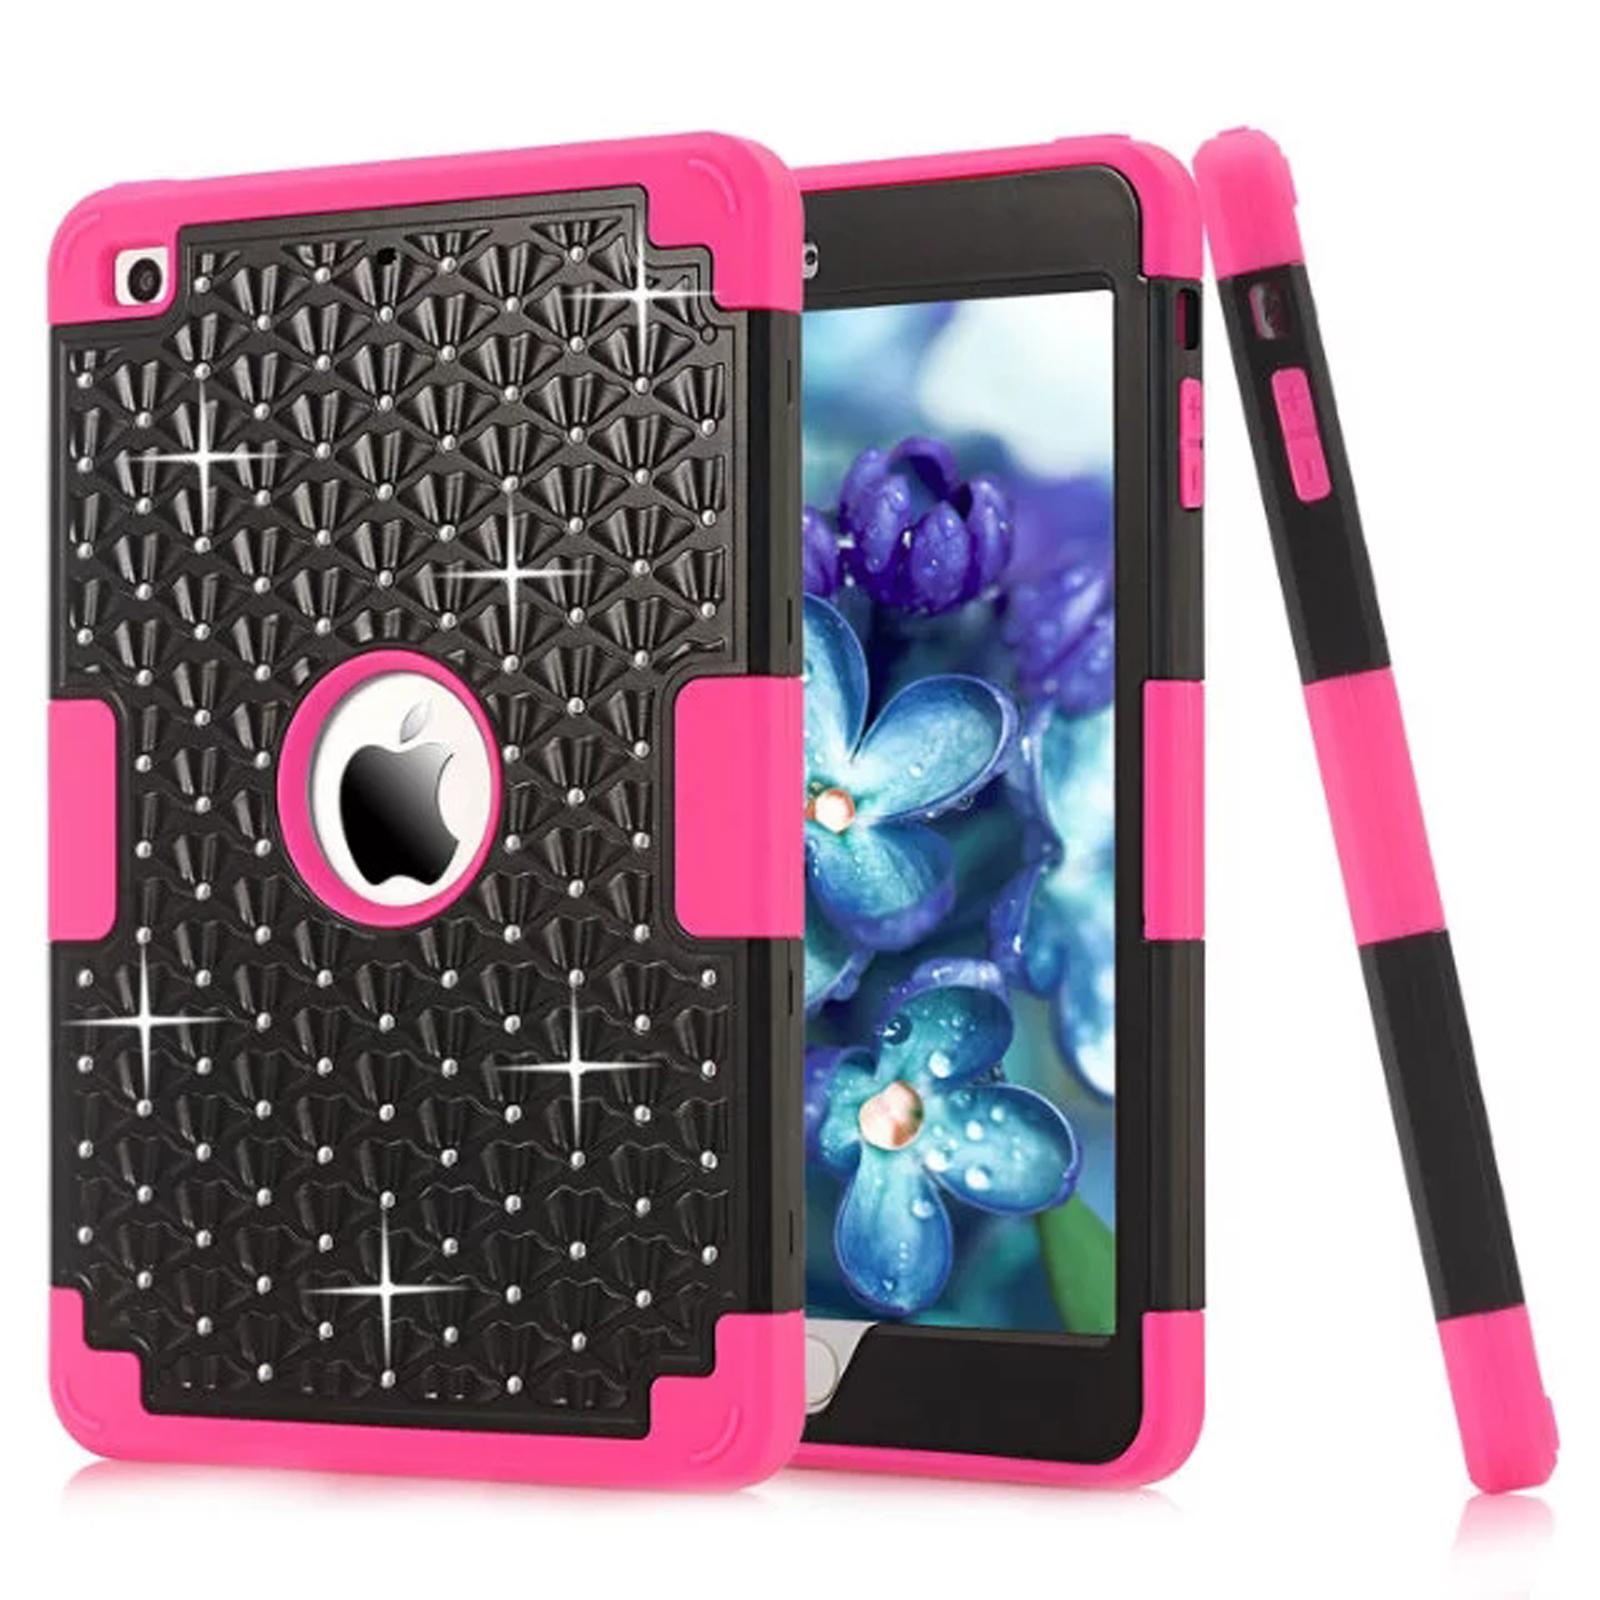 Dteck Shockproof Case For Apple iPad mini/mini 2/mini 3 Bling Diamond Rubber Cover, GIFT For Kids Black